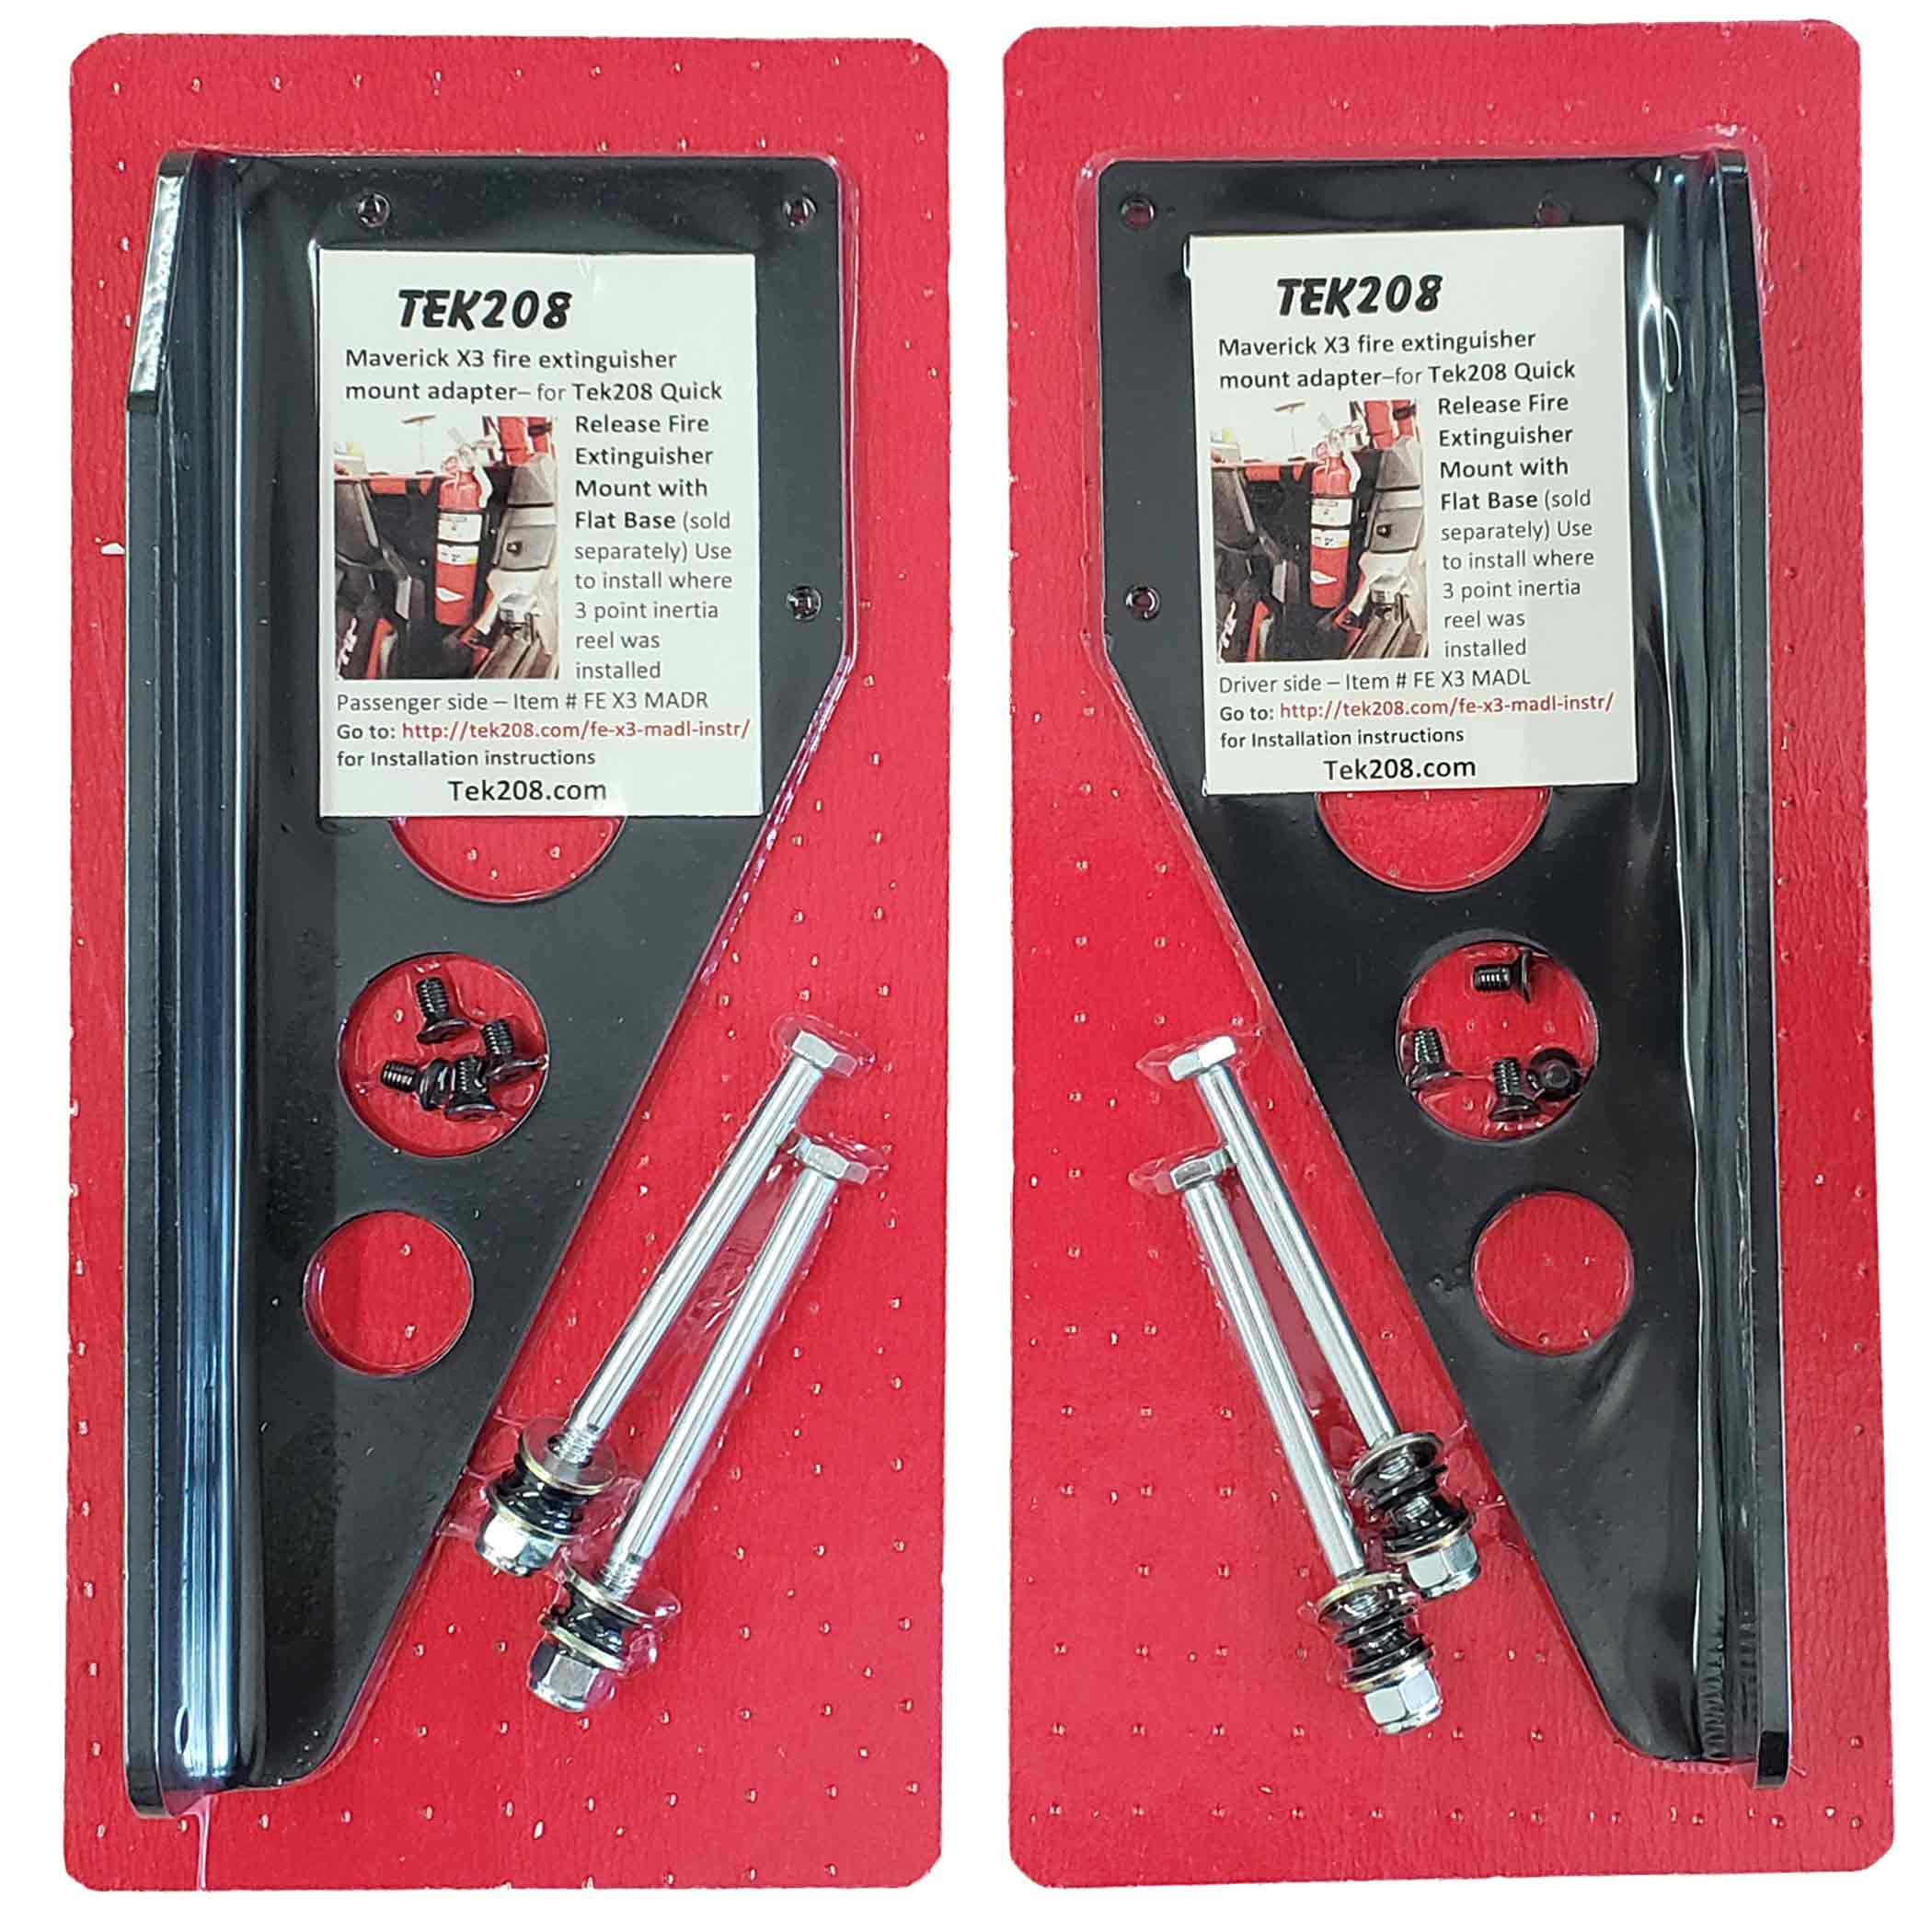 Can Am Maverick X3 Fire extinguisher mount